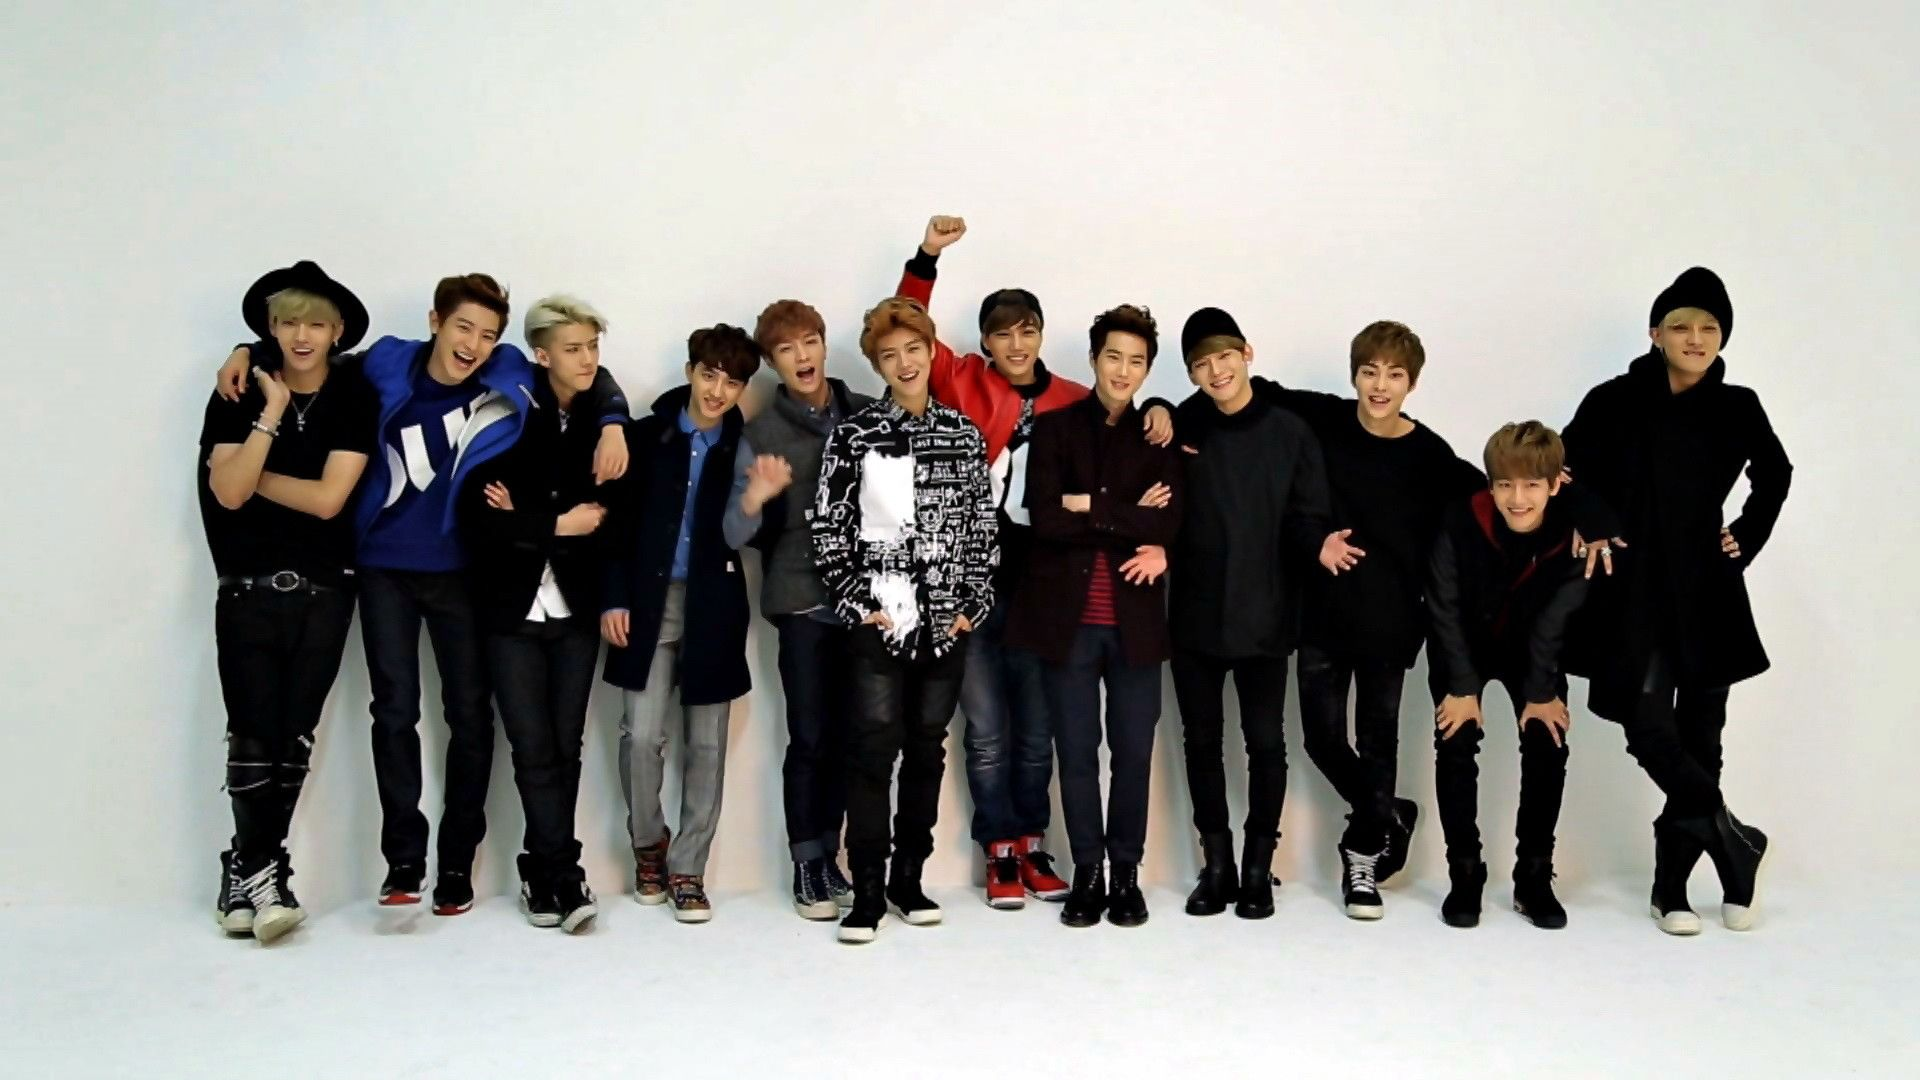 1920x1080 Exo Showtime Exo Wallpaper Hd Exo Background